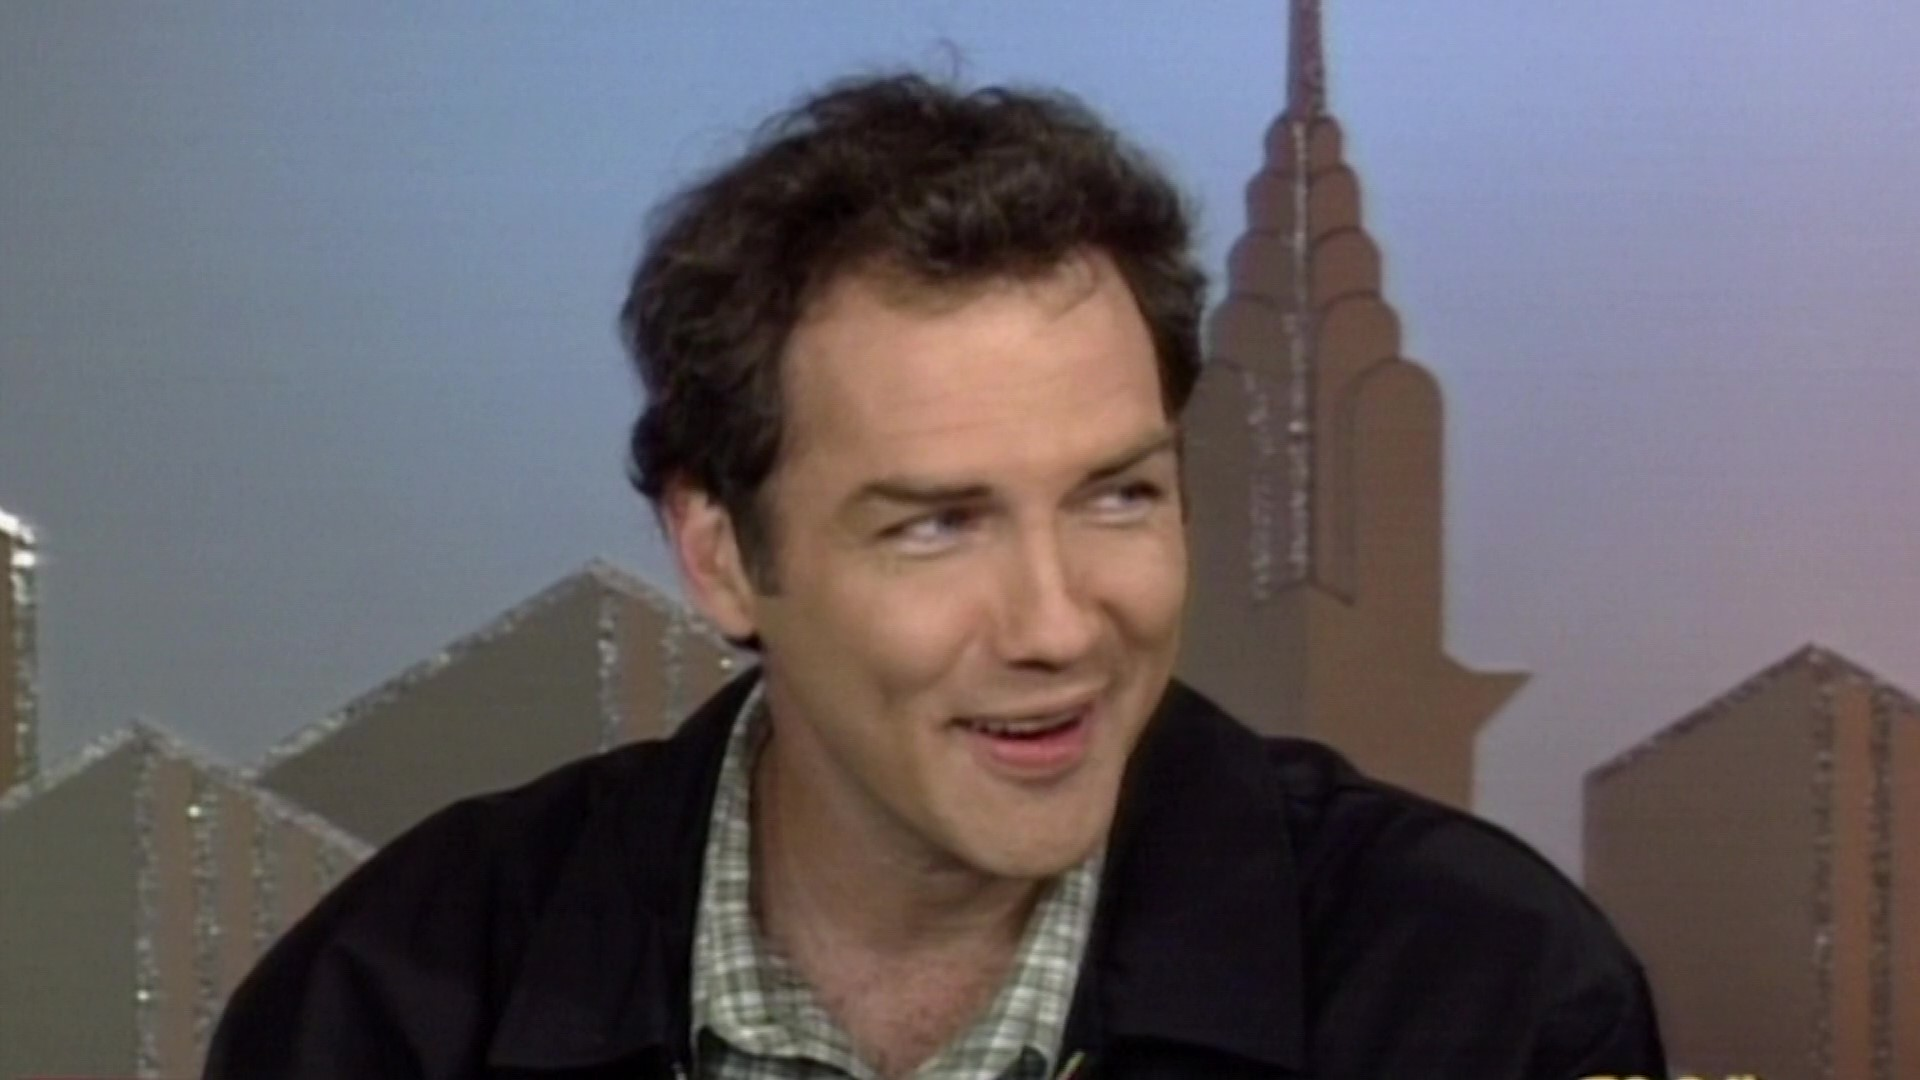 Norm Macdonald, comedian and 'Saturday Night Live' star ...